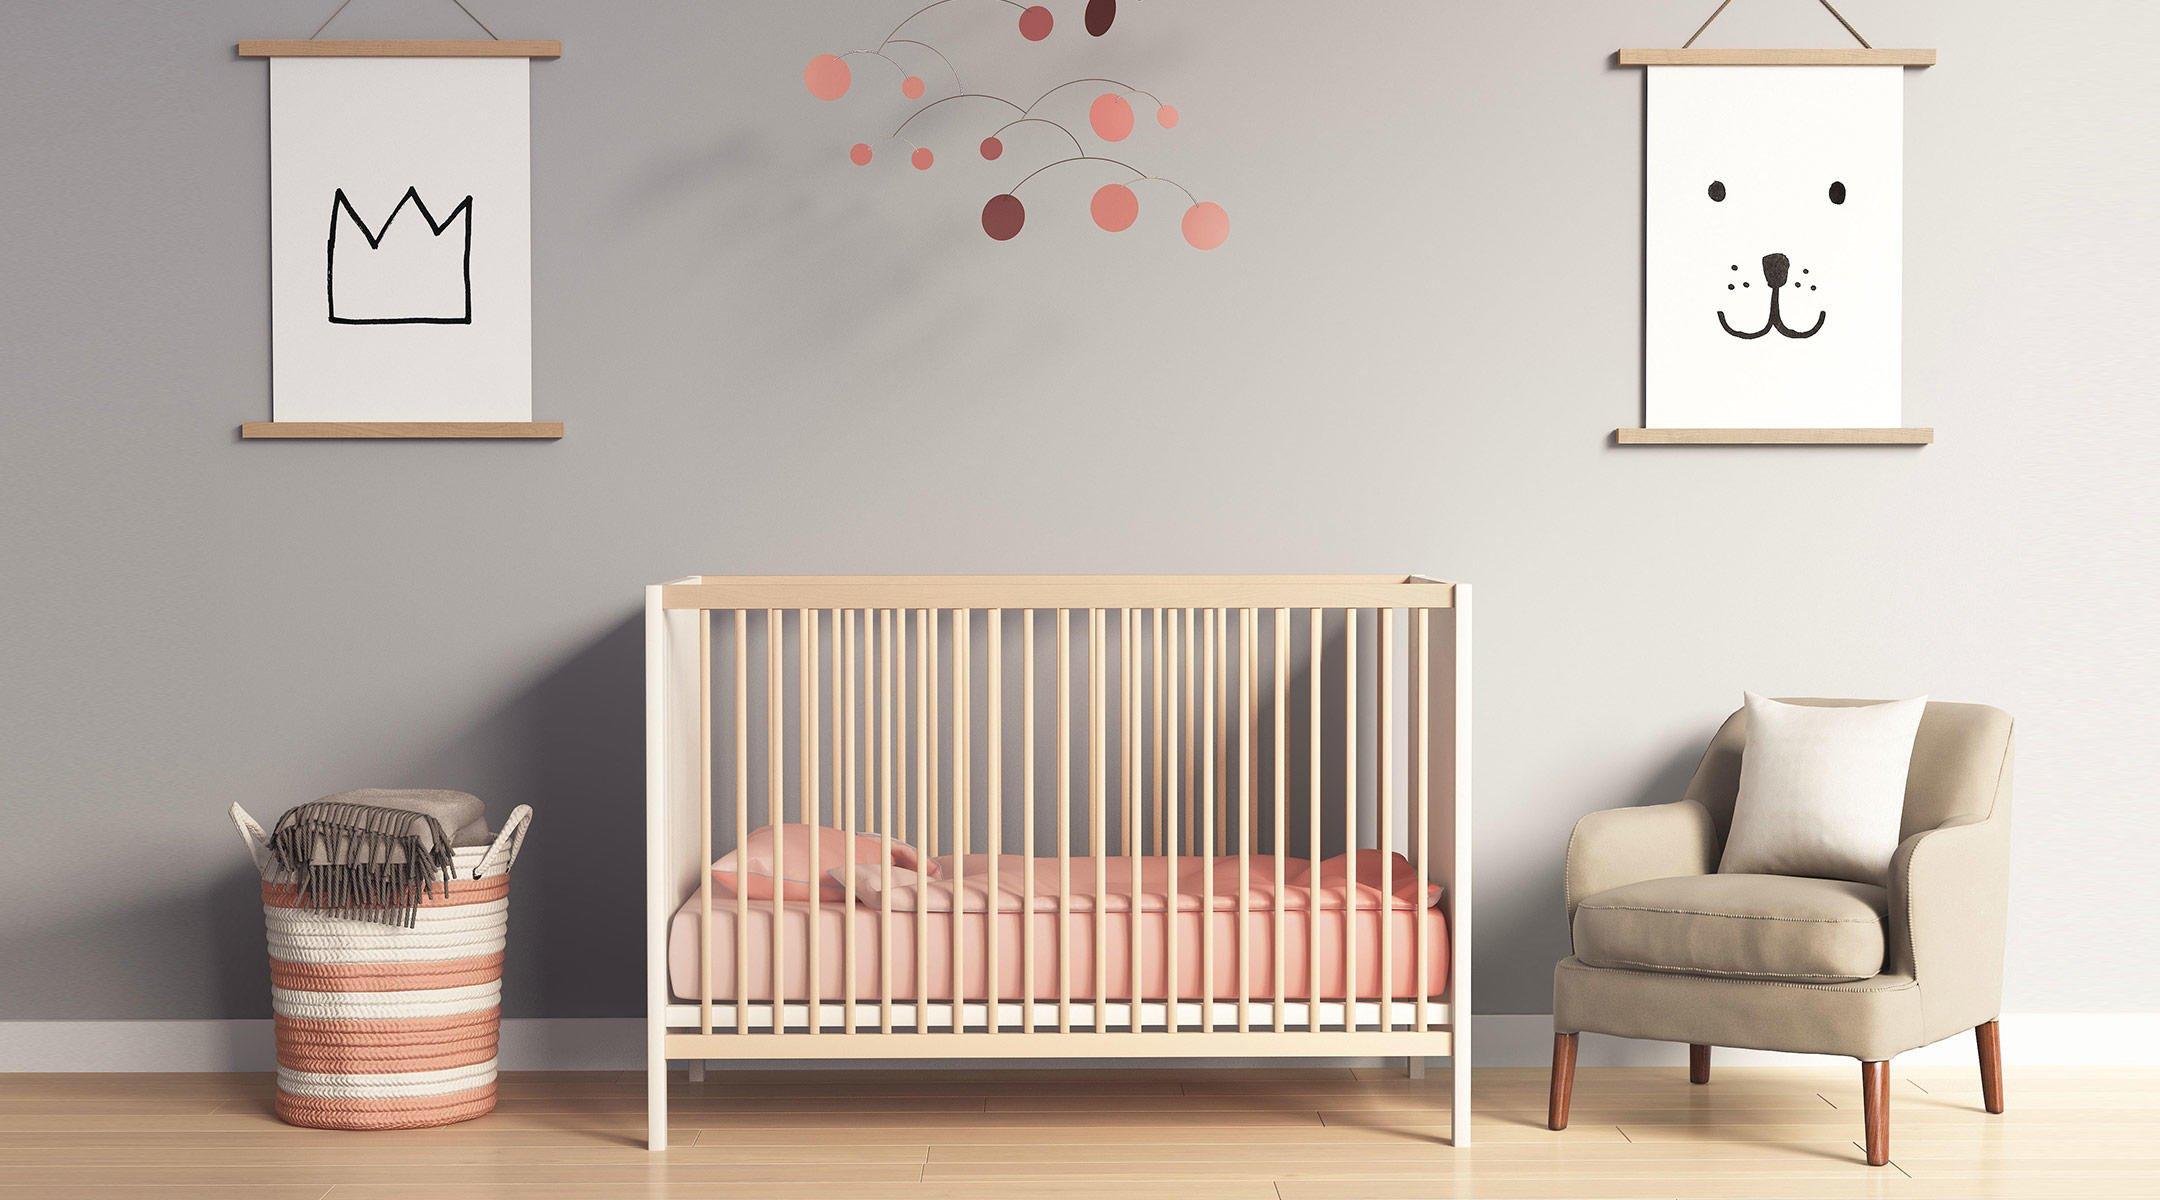 Baby Room Wall Decor Ideas Best Of 21 Inspiring Nursery Wall Decor Ideas